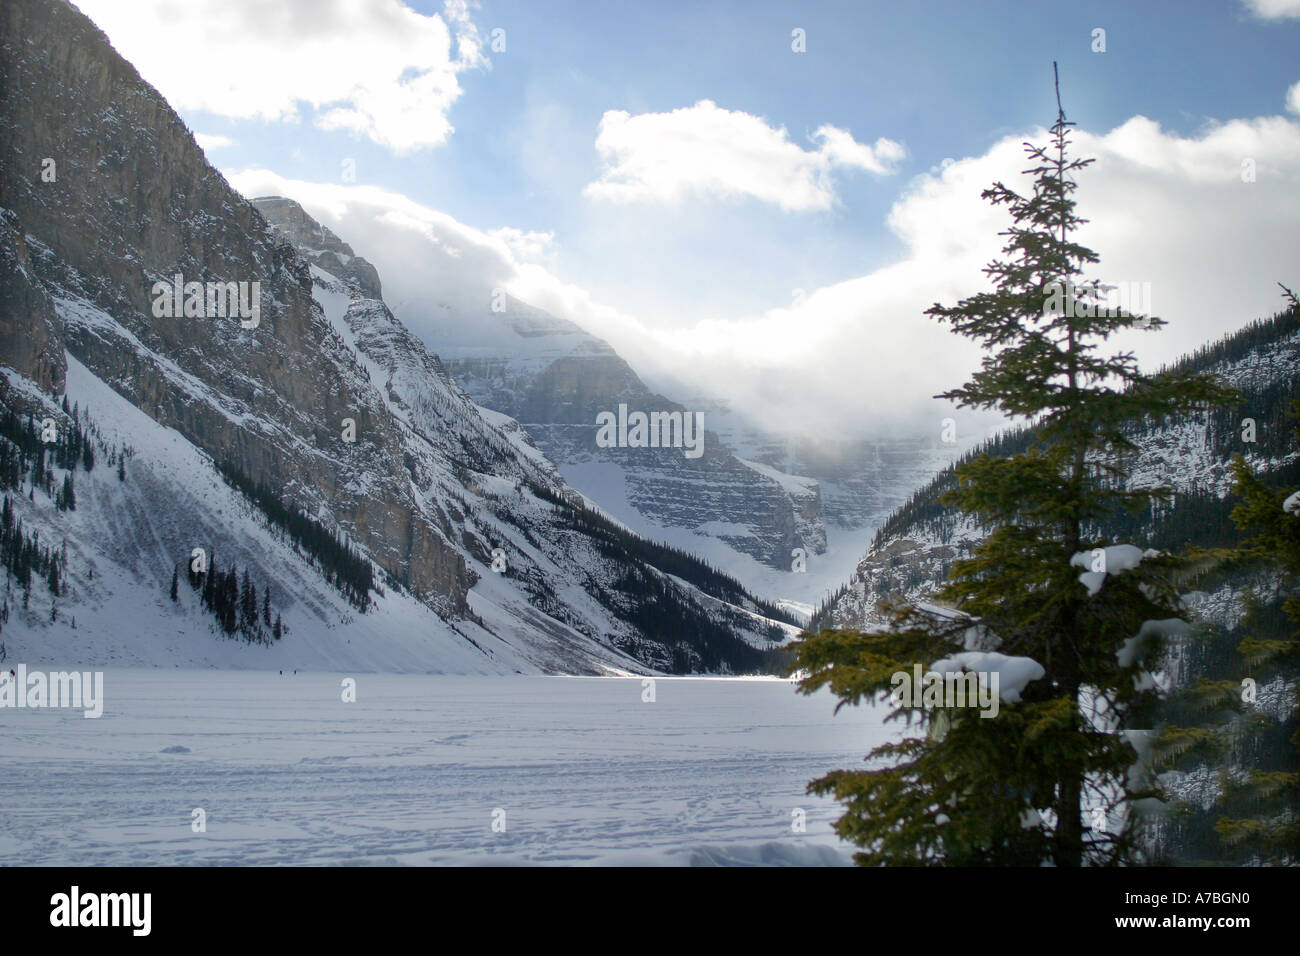 Mountain landscape, frozen lake - Stock Image